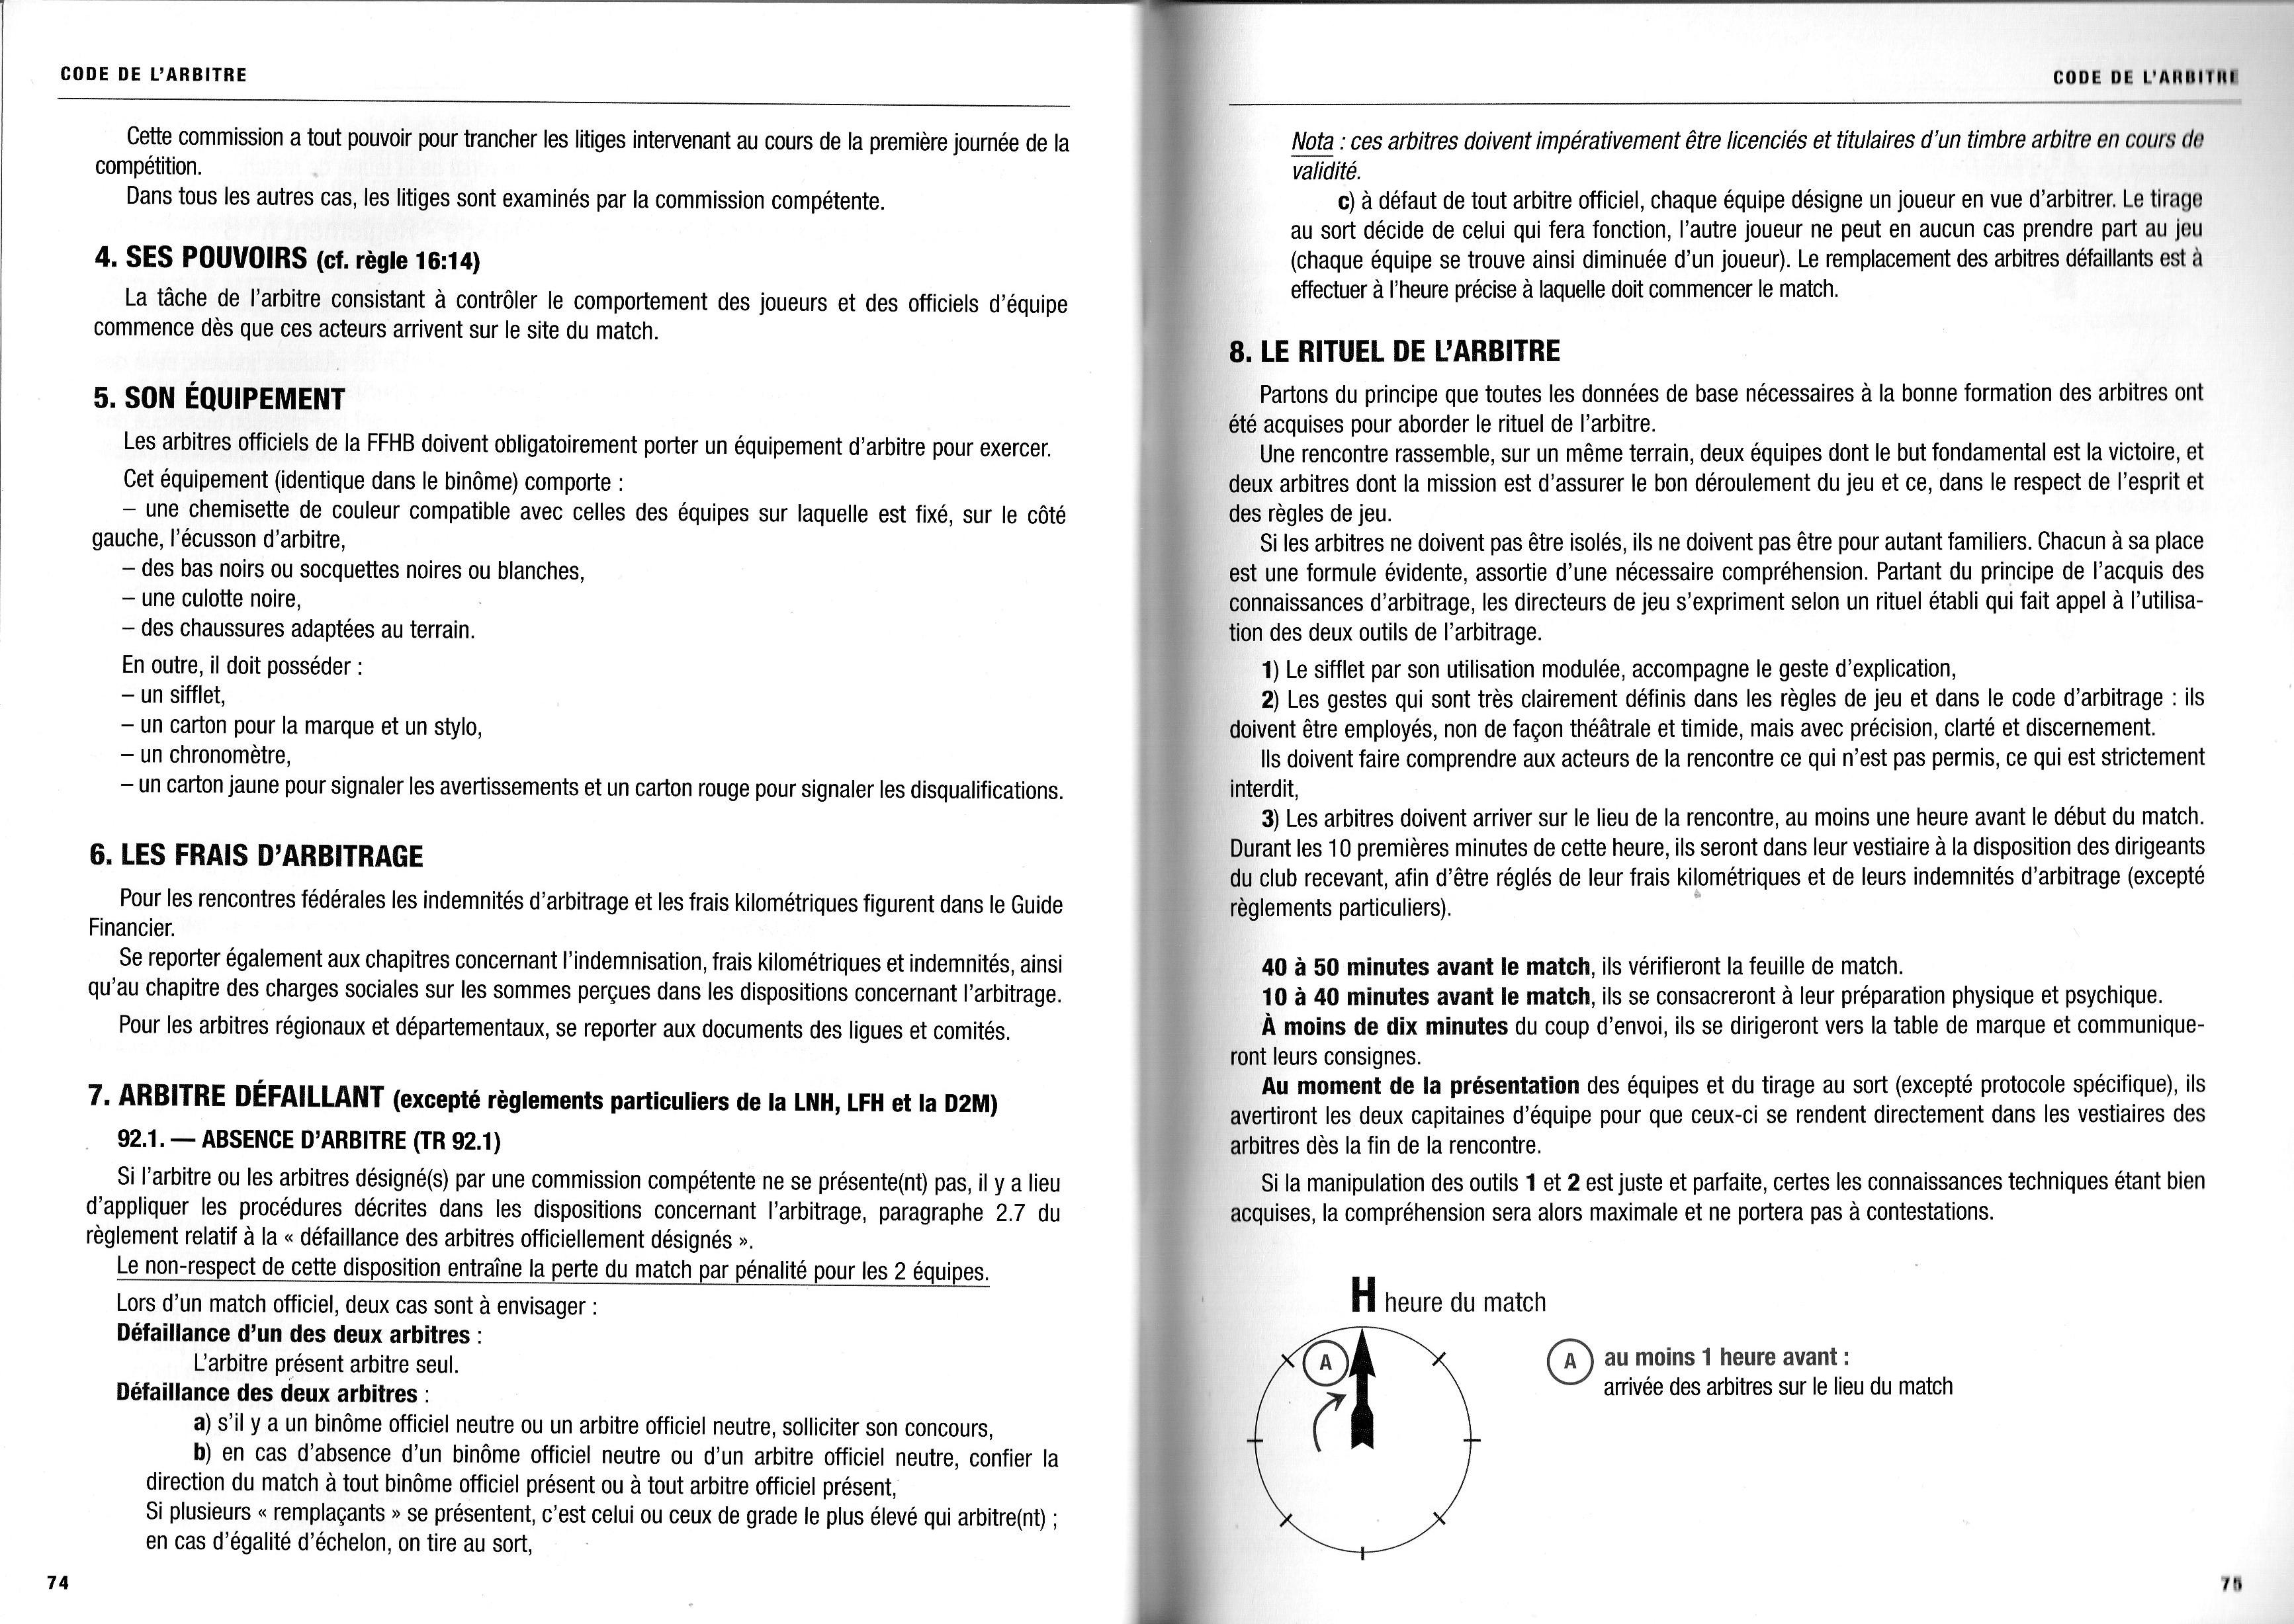 Nouvelle page club handball beex va pm hb clubeo for Code html lien nouvelle fenetre